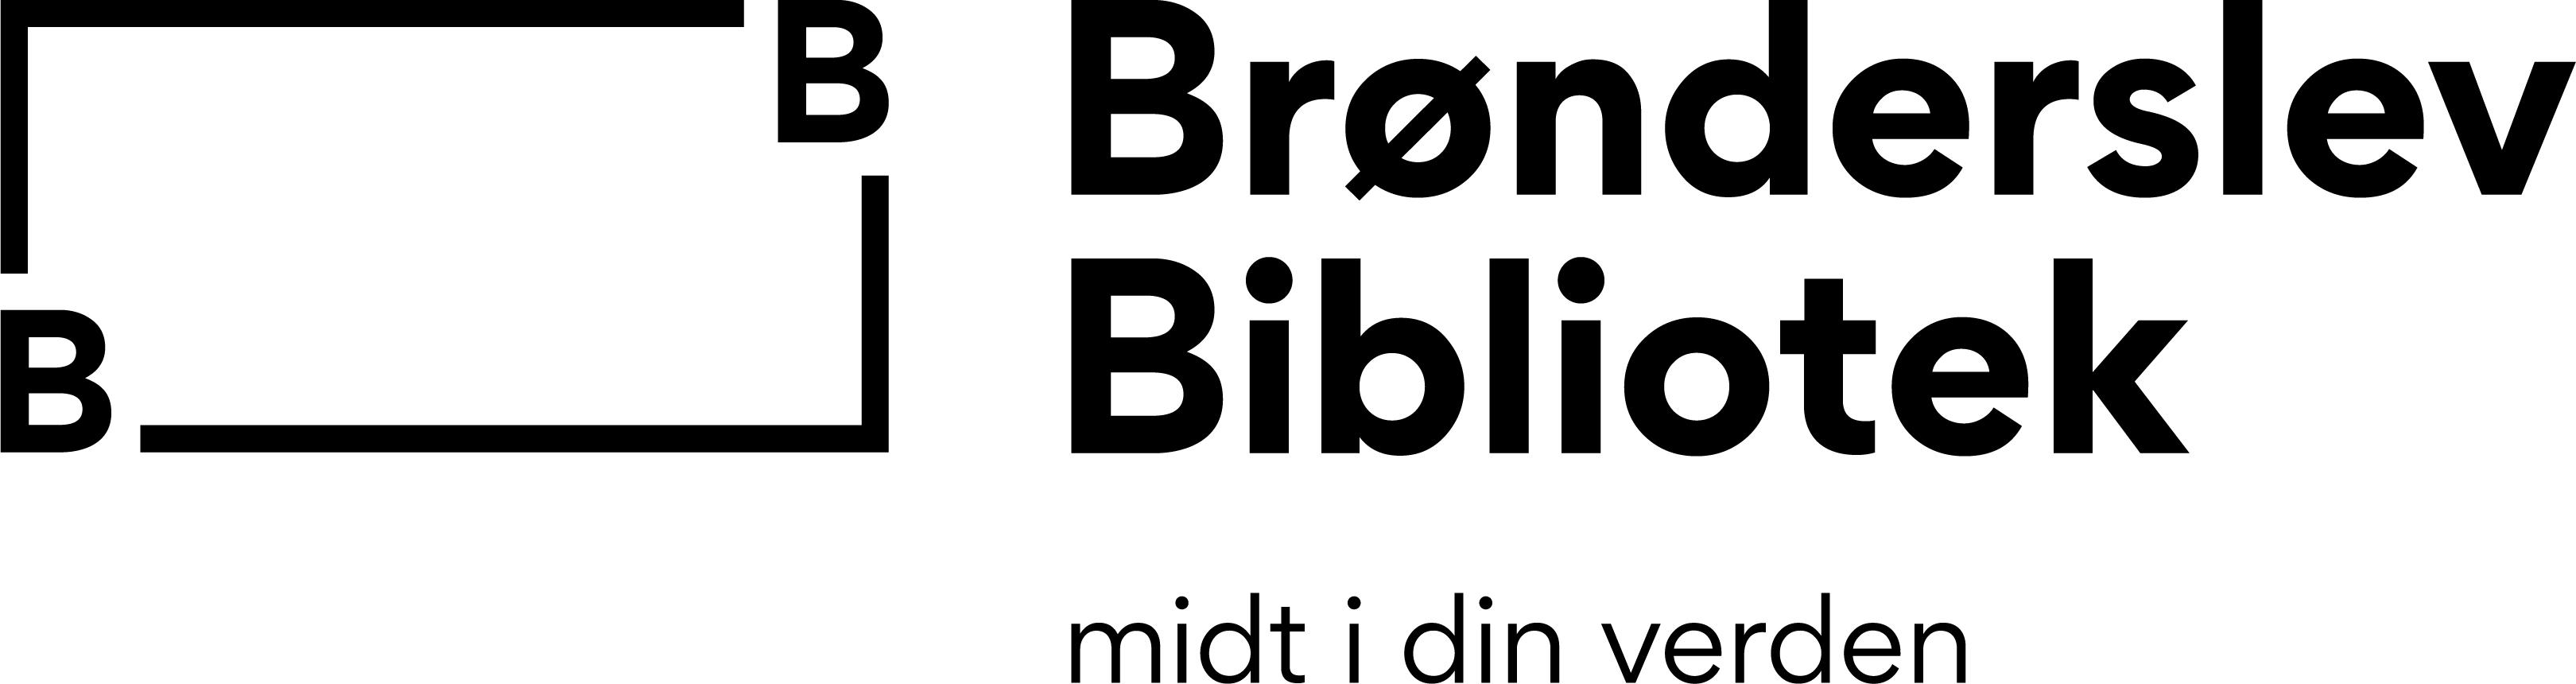 Brønderslev Bibliotek